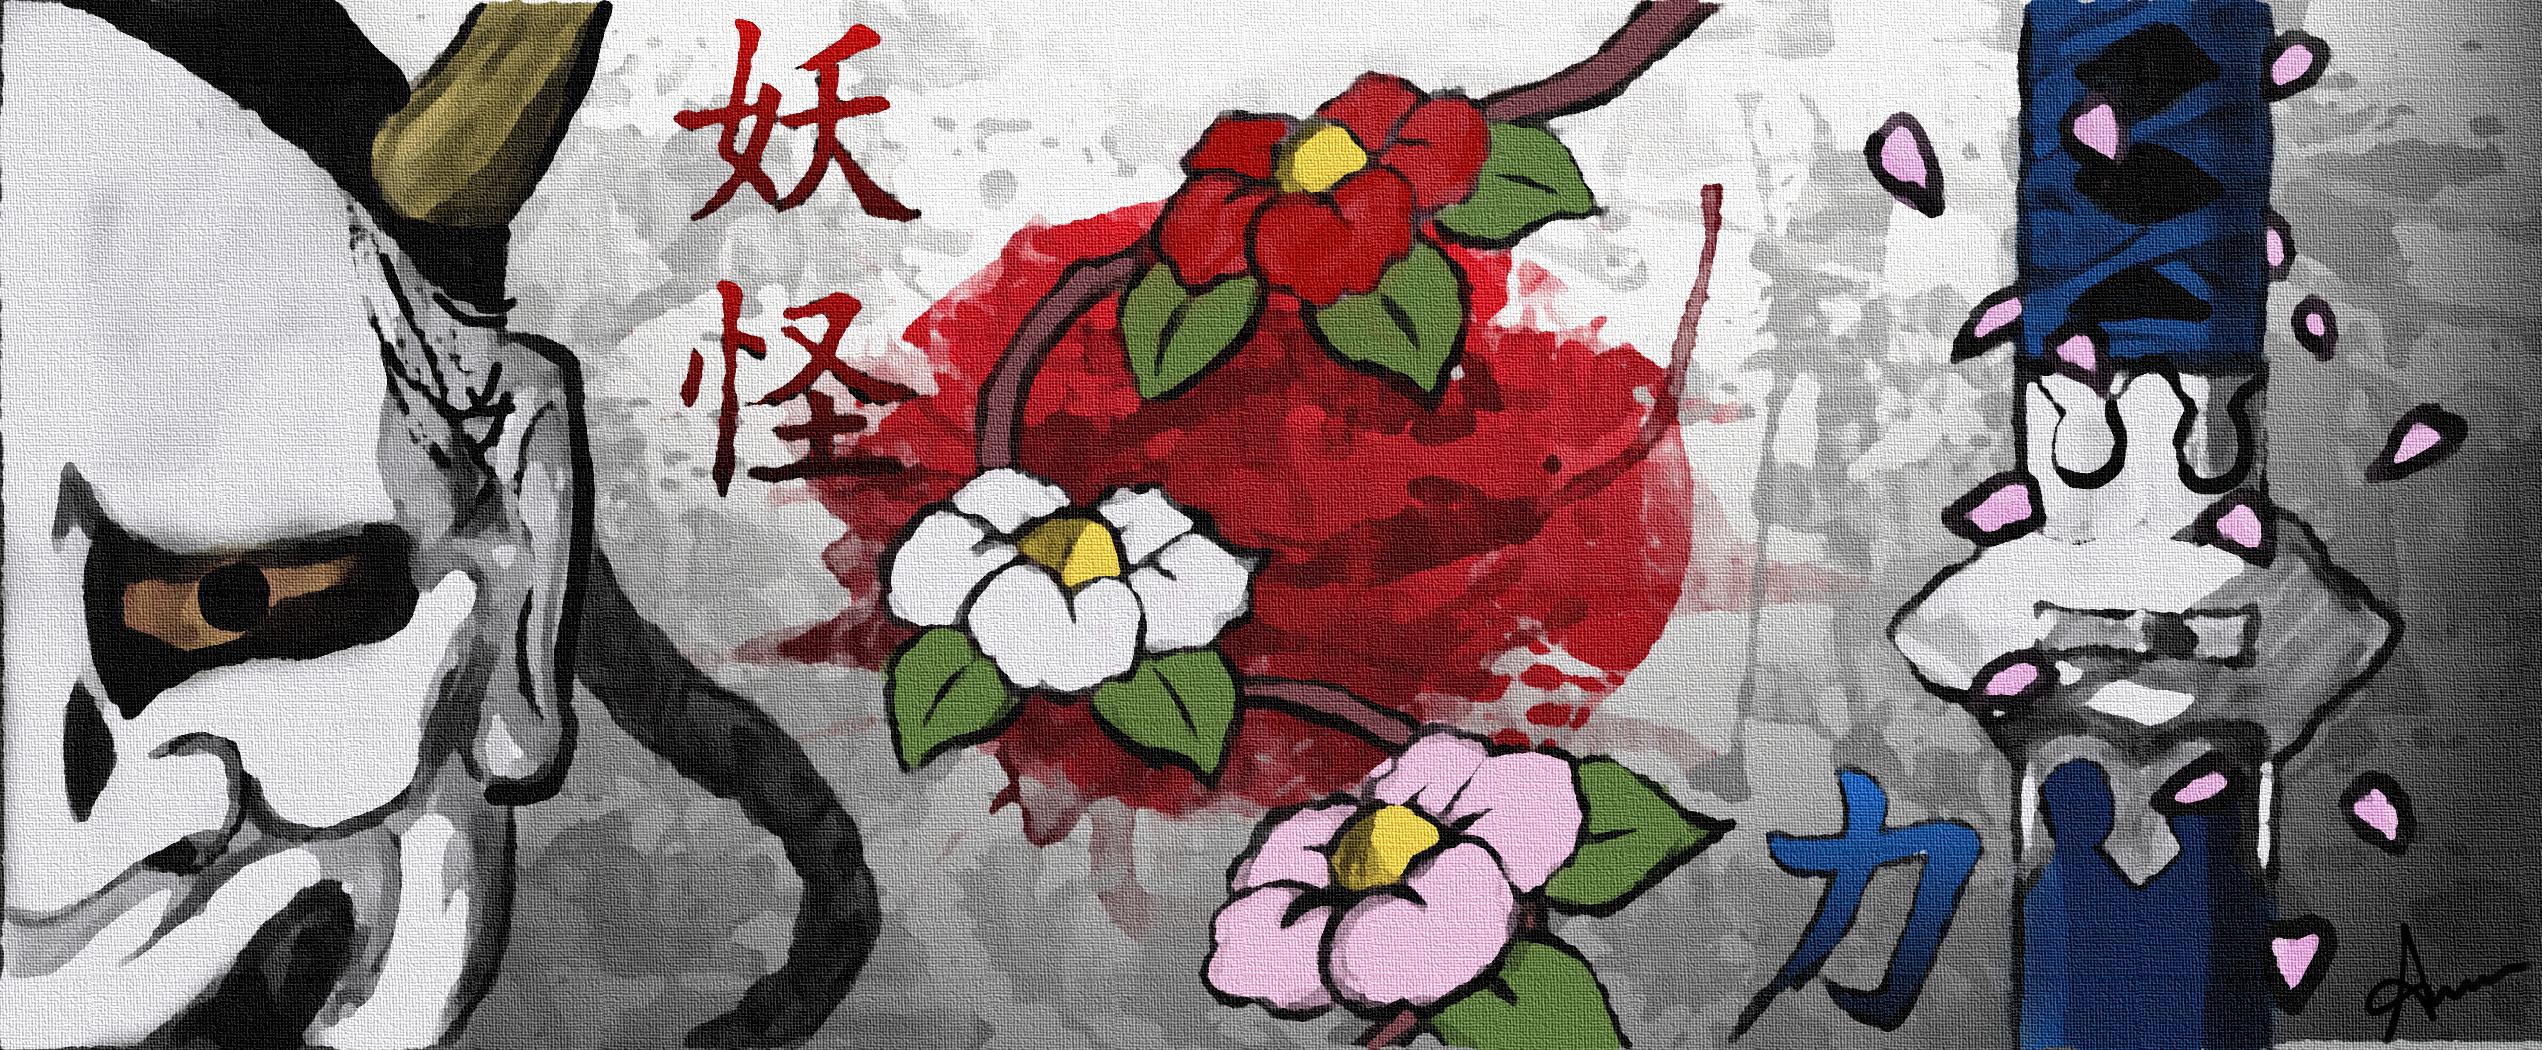 52 Rurouni Kenshin HD Wallpapers | Backgrounds - Wallpaper Abyss